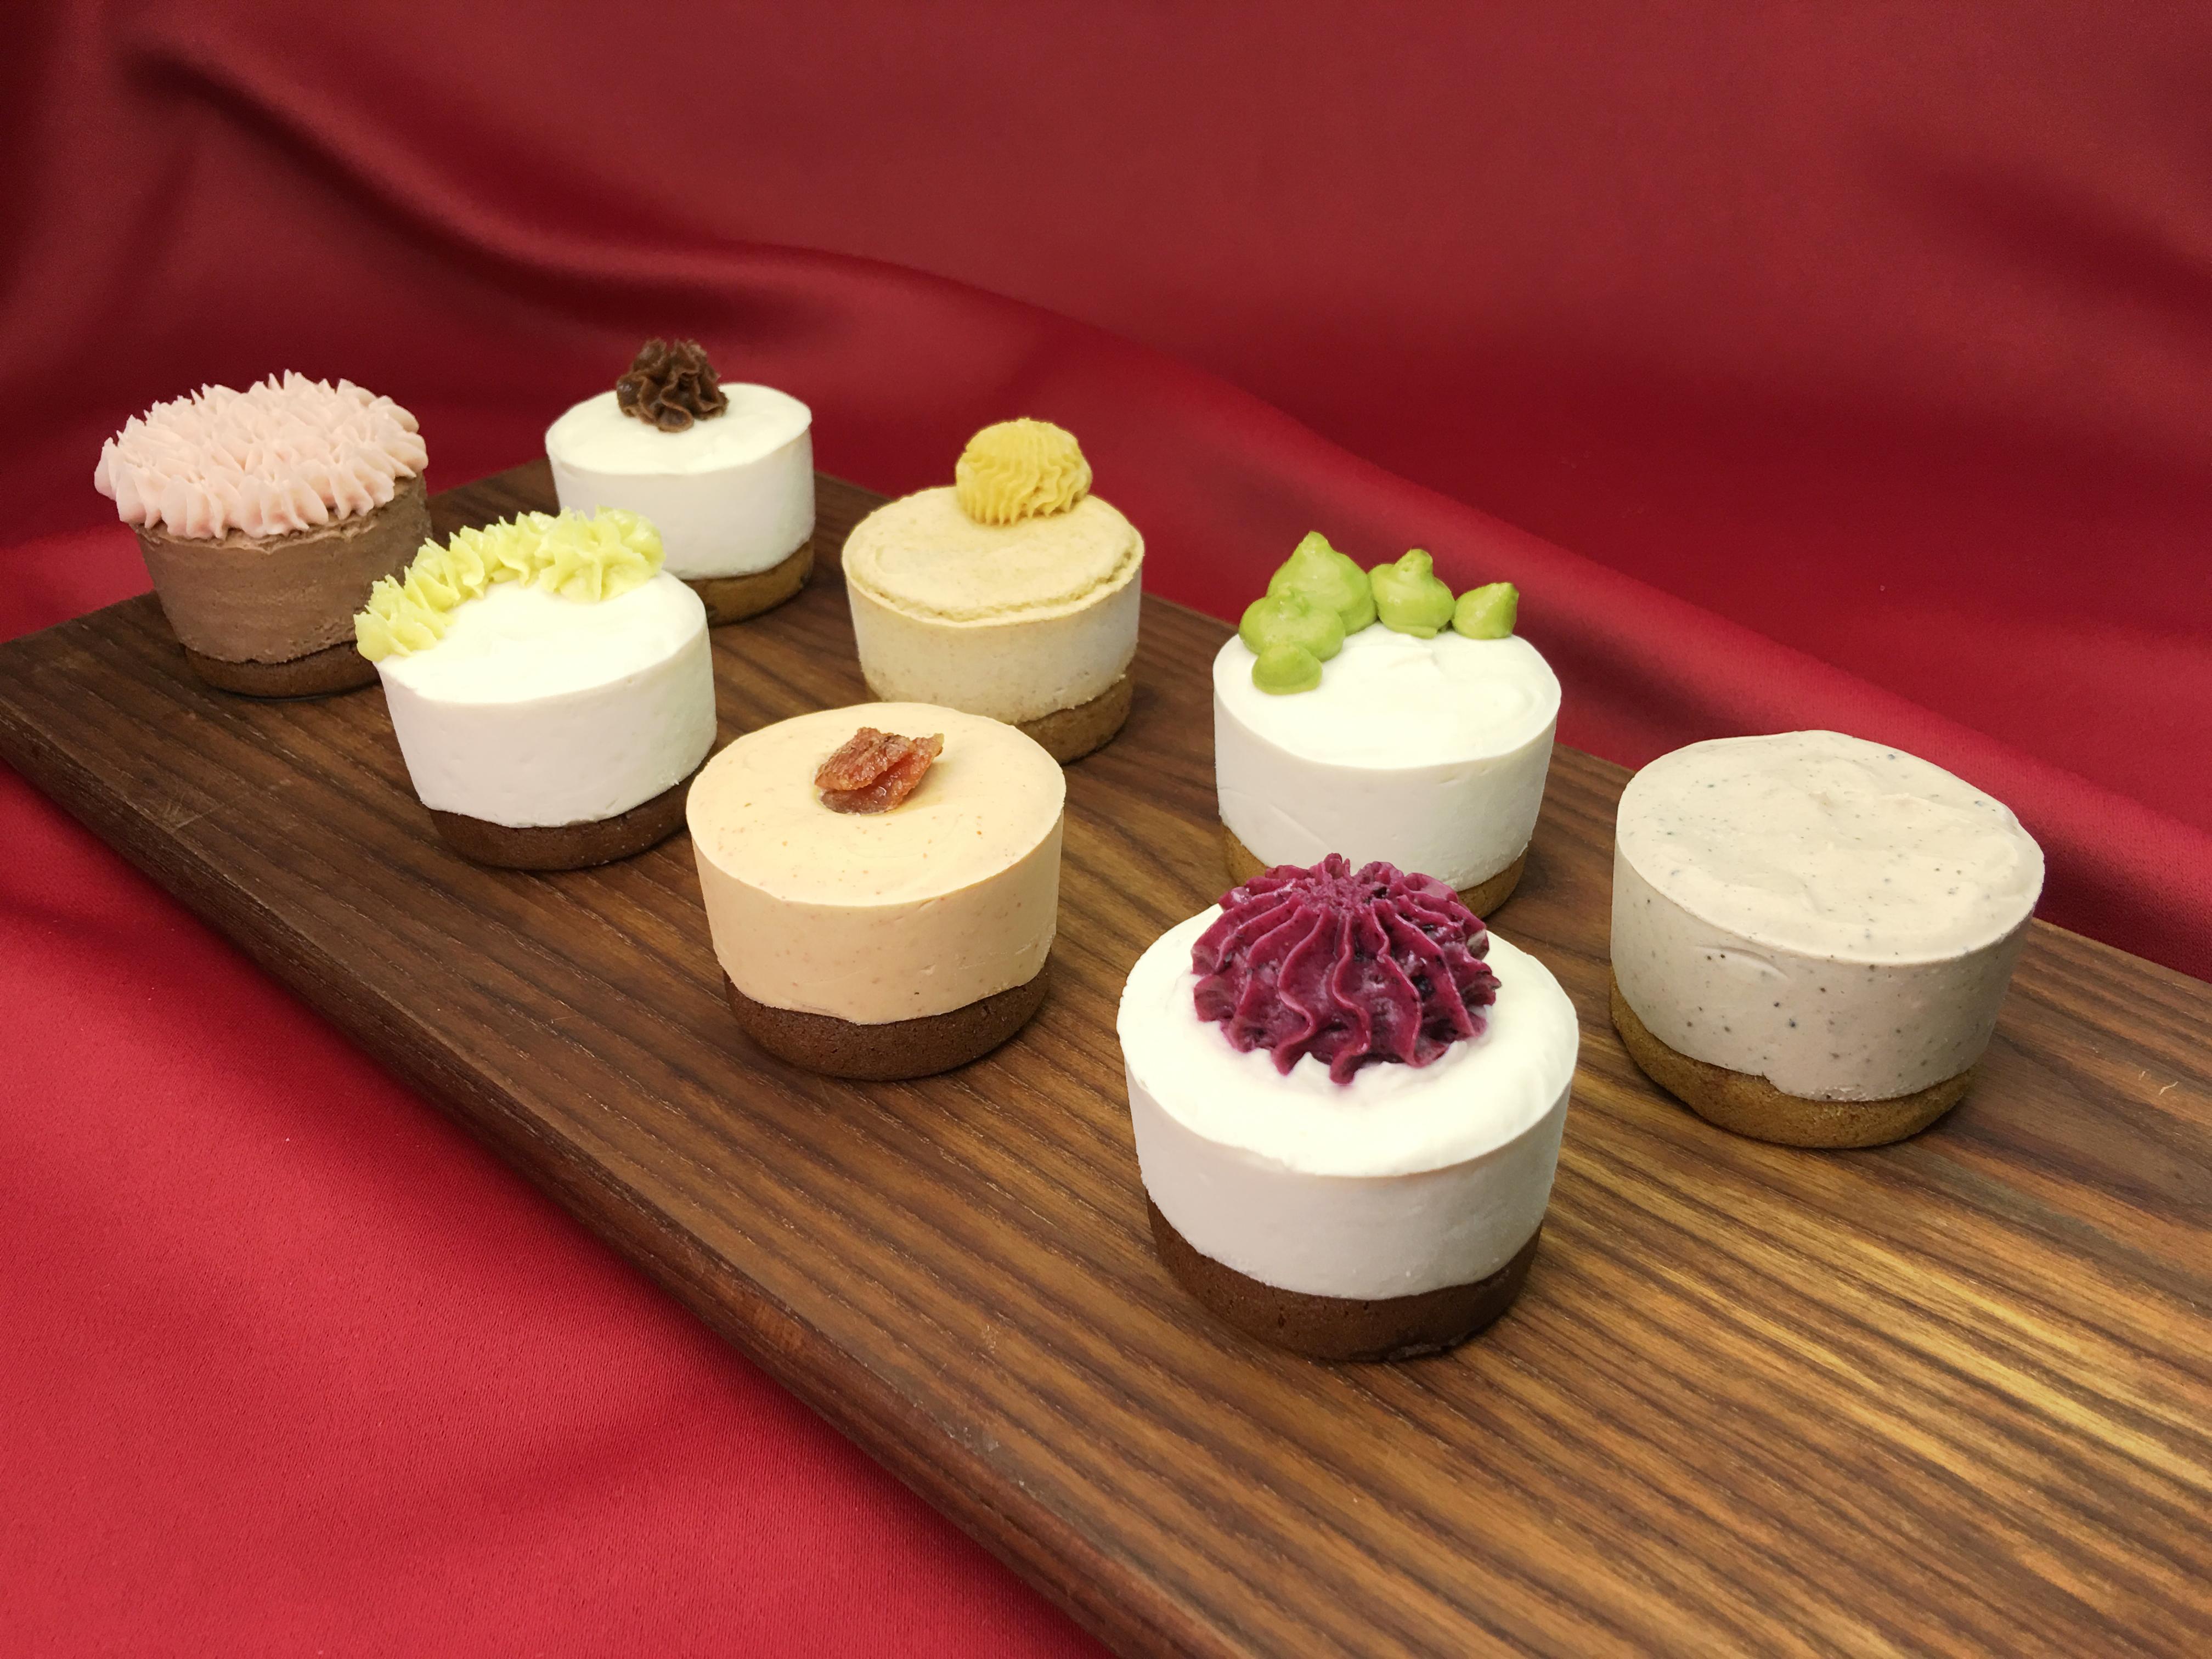 Gluten Free, Vegan, Allergy Friendly No-Bake Cheesecakes